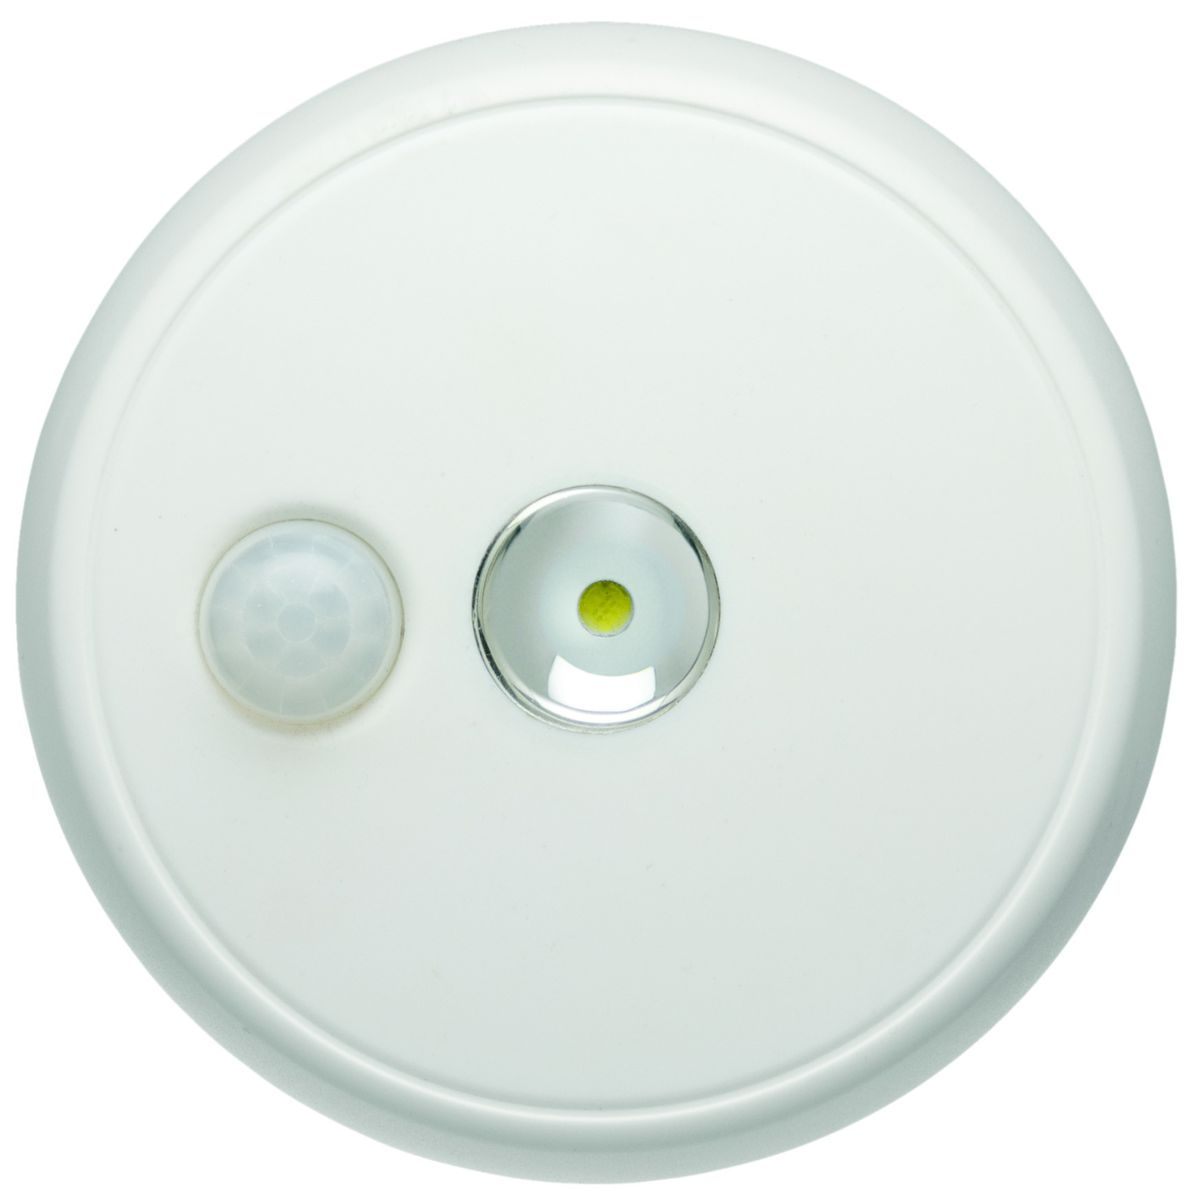 Led Ceiling Lights With Sensor: Mr Beams - Wireless Motion Sensor Led Ceiling Light - White